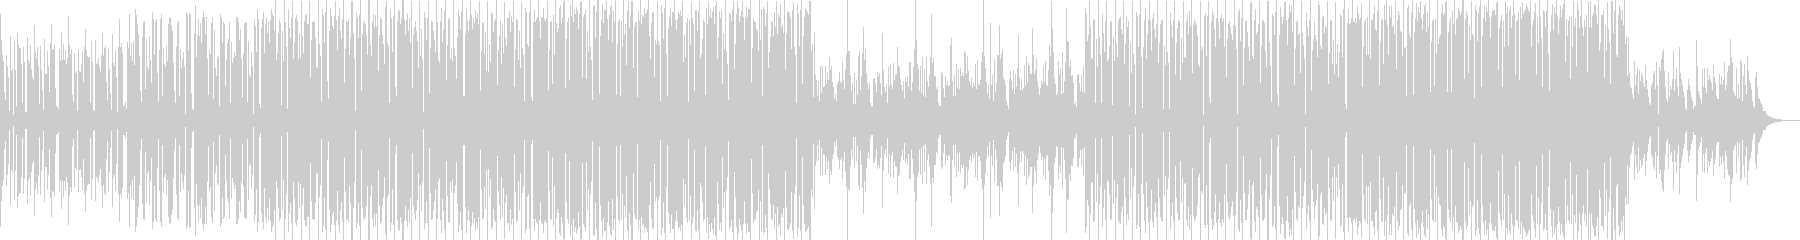 bpm120-あなたに夢中な情熱のEDMの未再生の波形